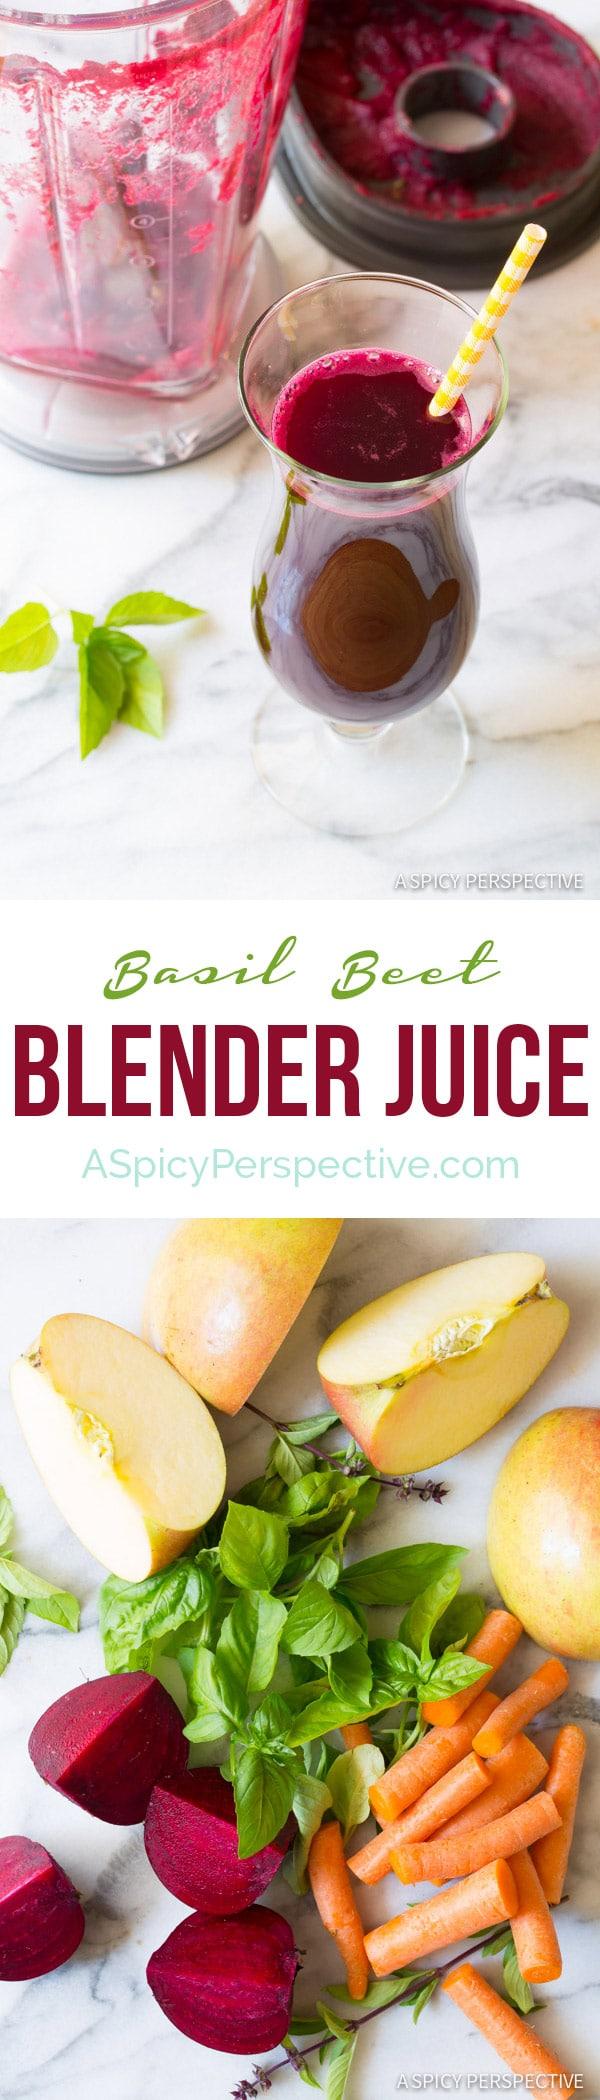 Fabulous 4 Ingredient Basil Beet Juice Recipe (Blender Juice) on ASpicyPerspective.com + An Awesome KitchenAid Torrent Magnetic Drive Blender Giveaway Valued at $599! #juice #giveaway